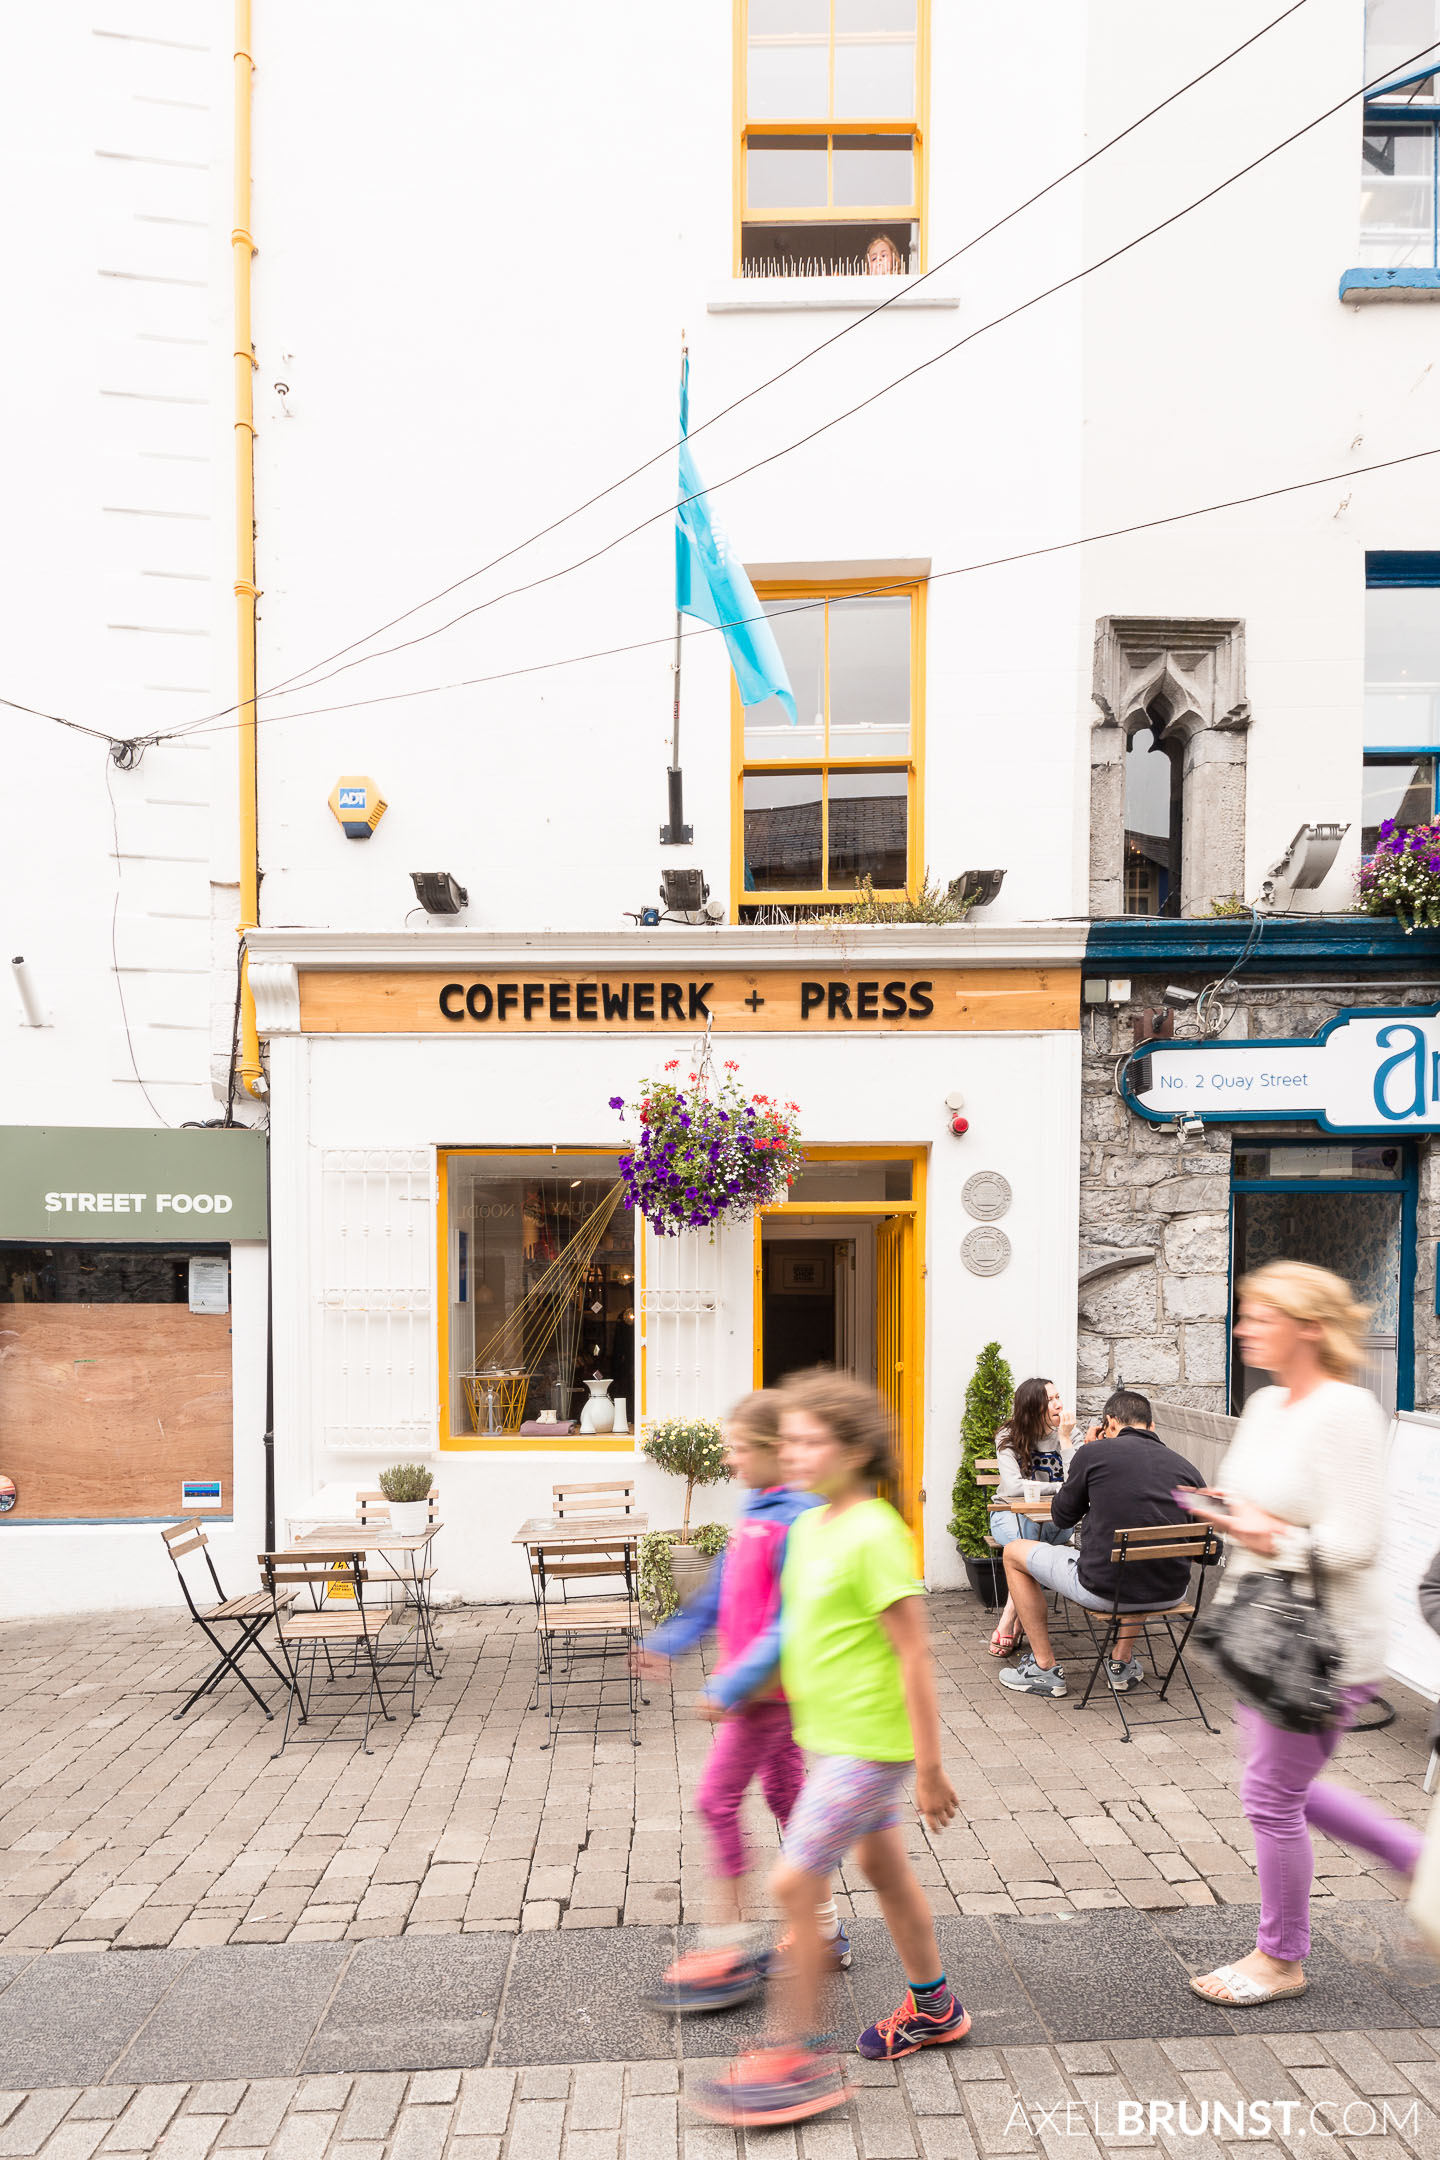 Coffeewerk+Press-Gallway-Ireland-6.jpg